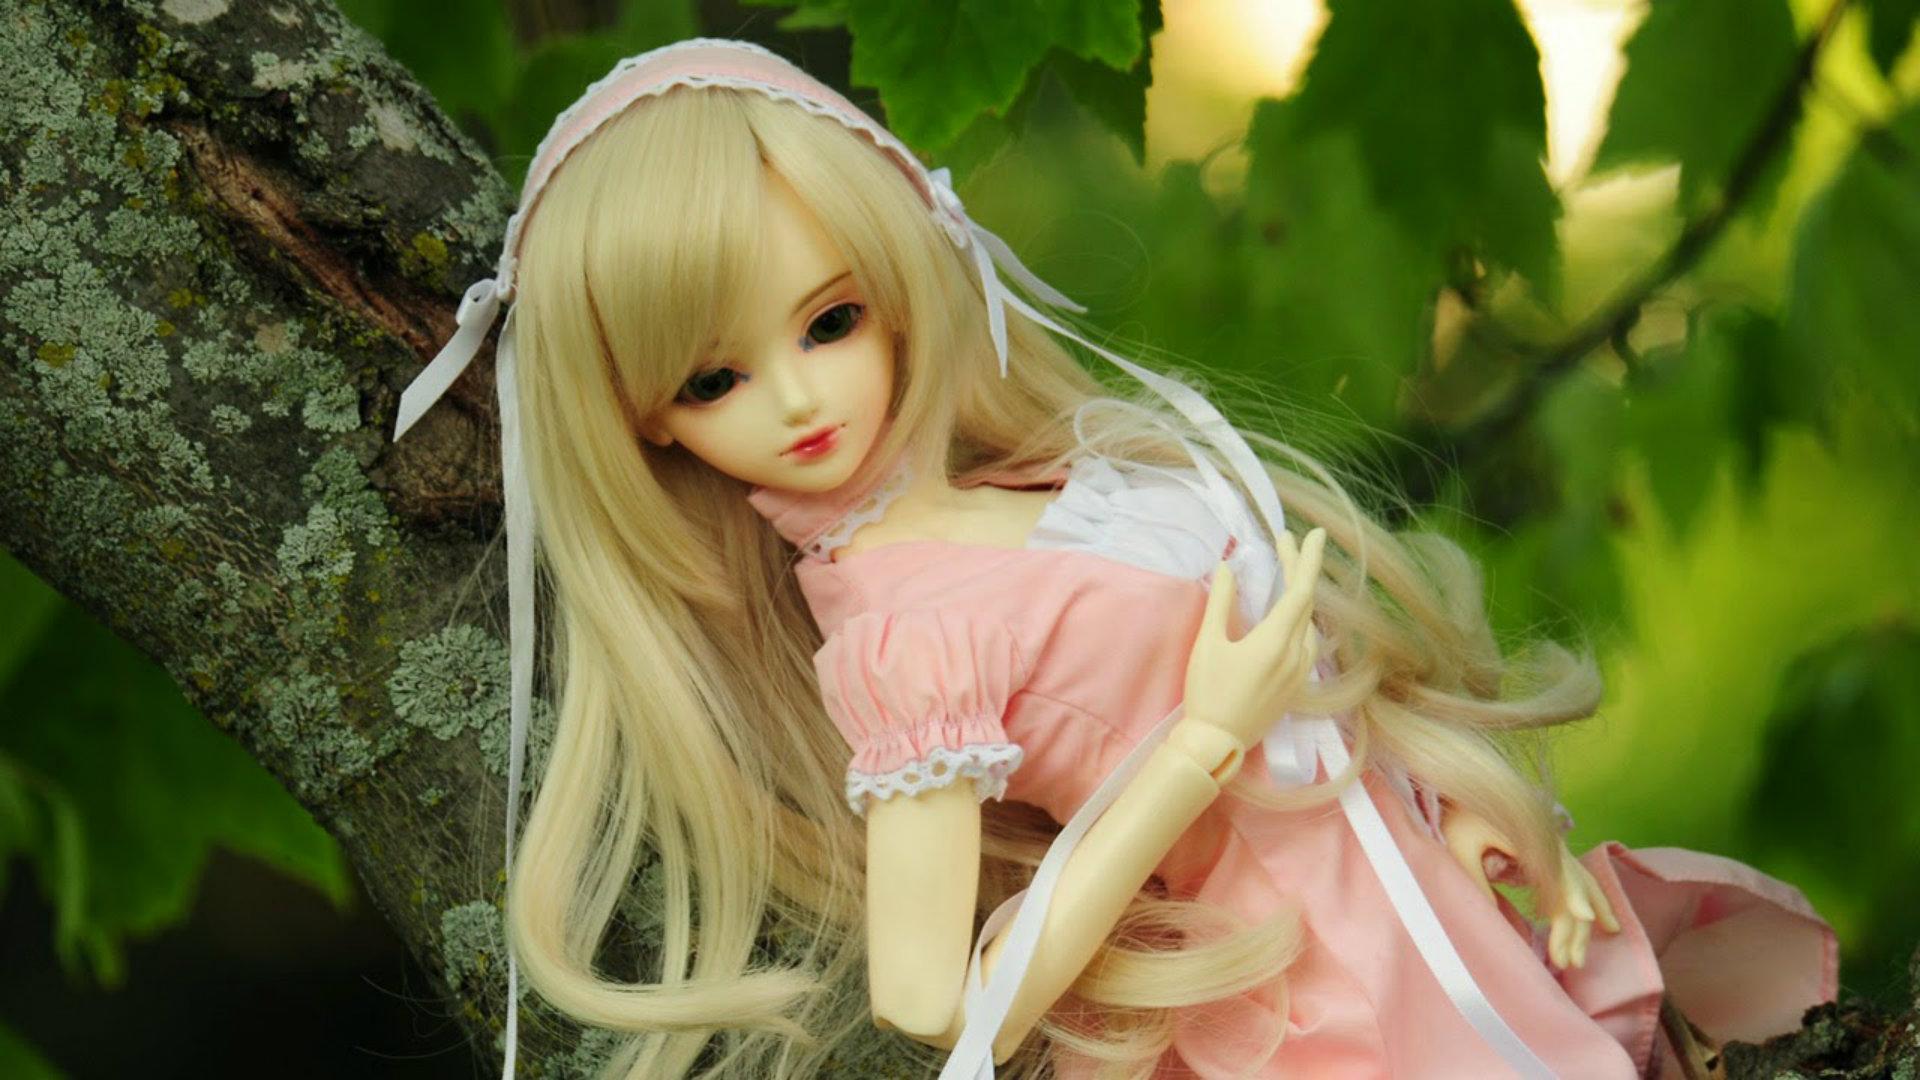 Latest Doll Wallpaper Full Hd Barbie Doll 51100 Hd Wallpaper Backgrounds Download